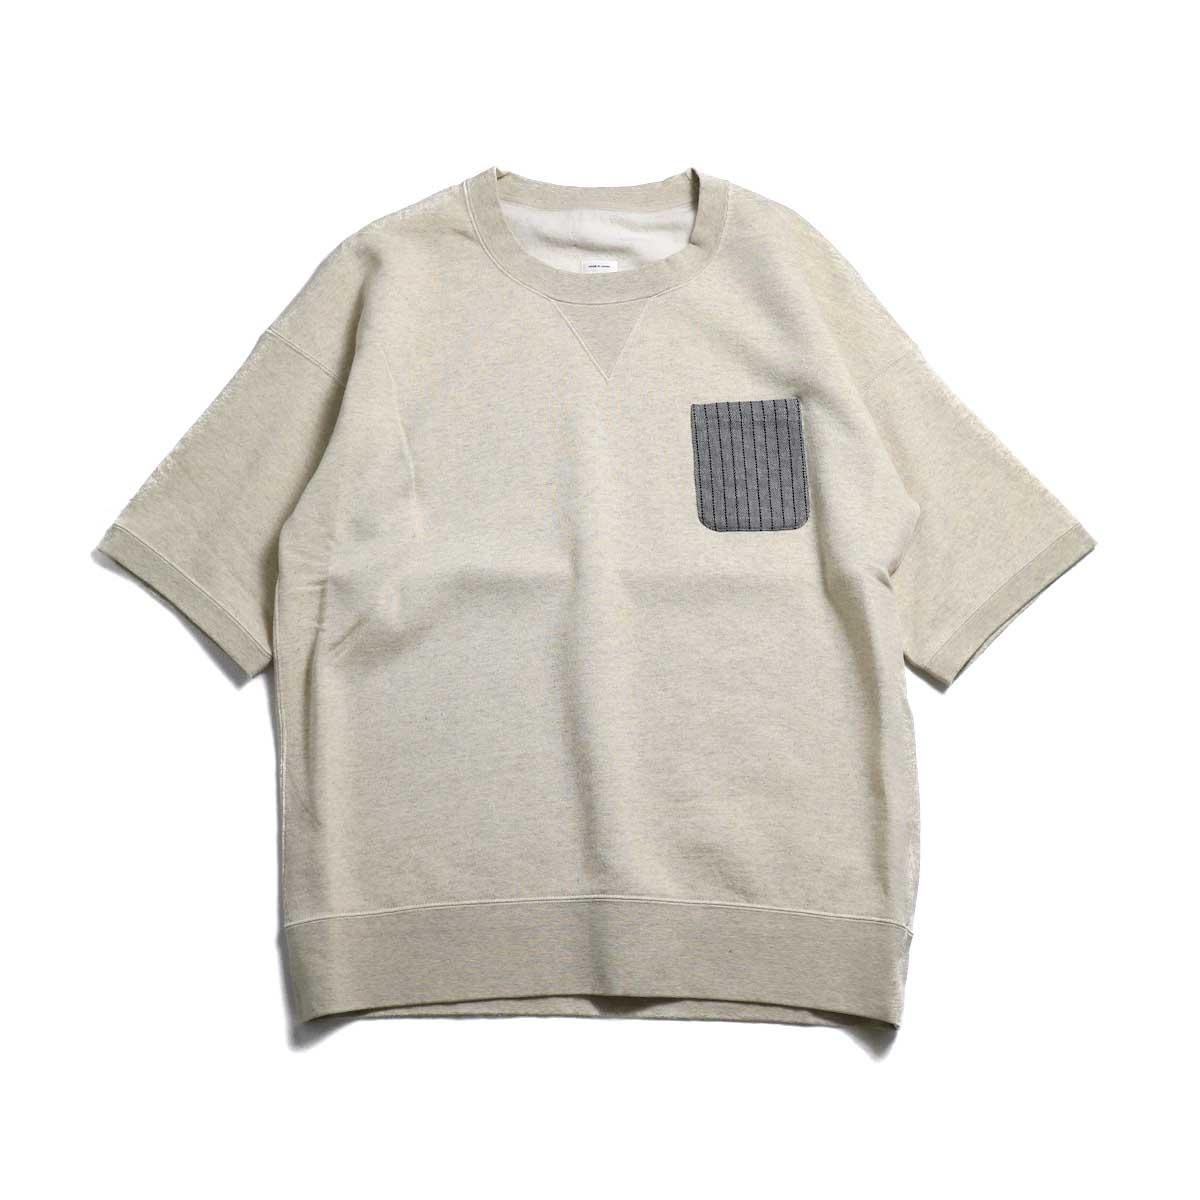 visvim / JUMBO PCKT S/S -Grey